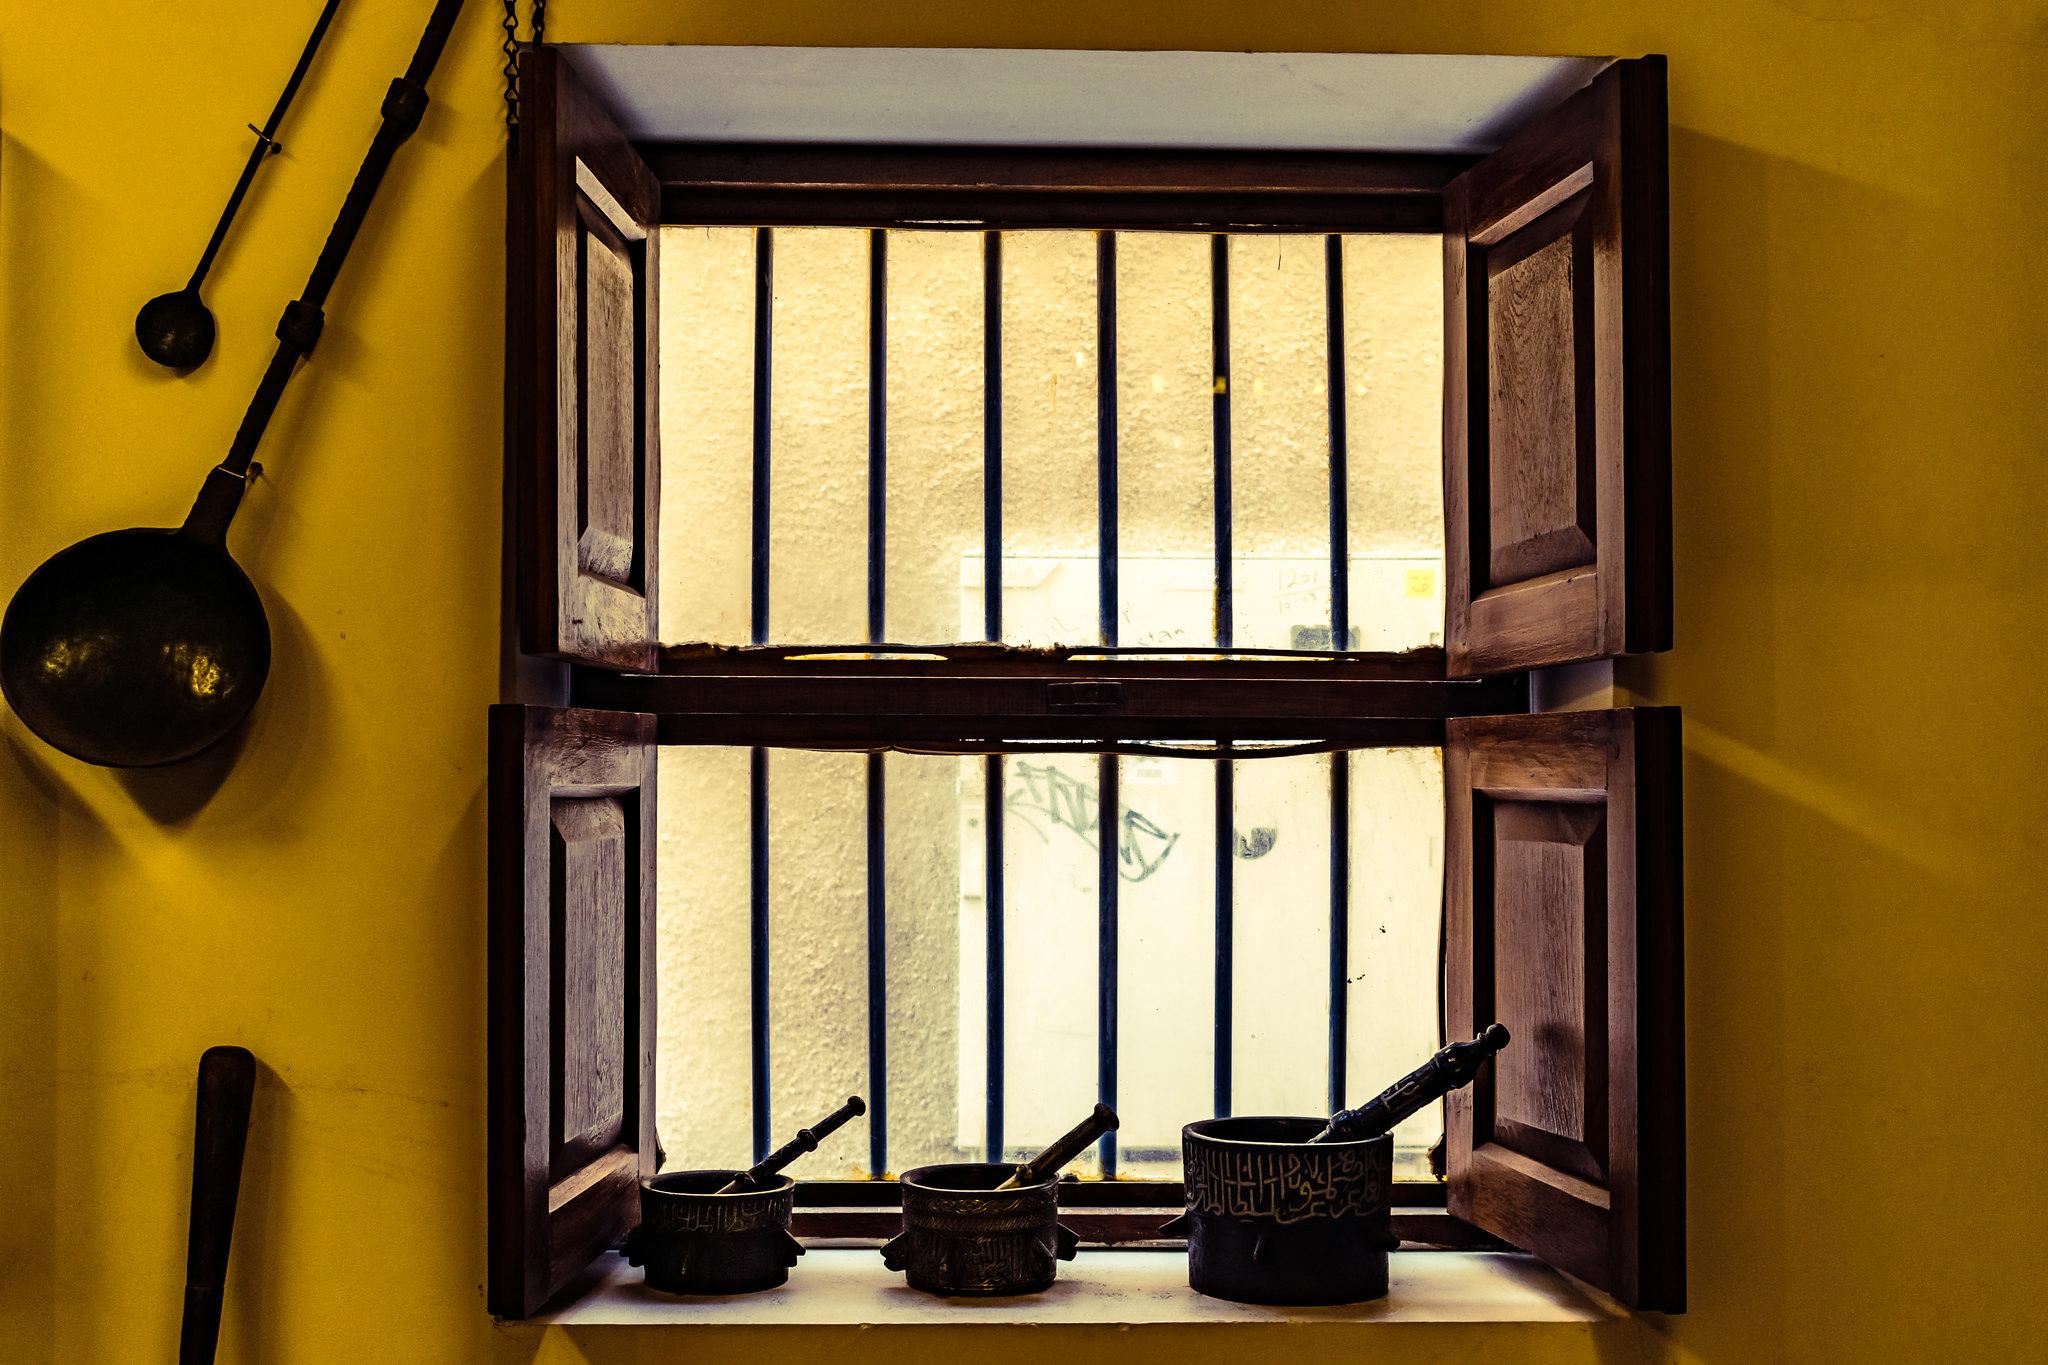 Coffee Museum, photo by Hoda Beltagui.